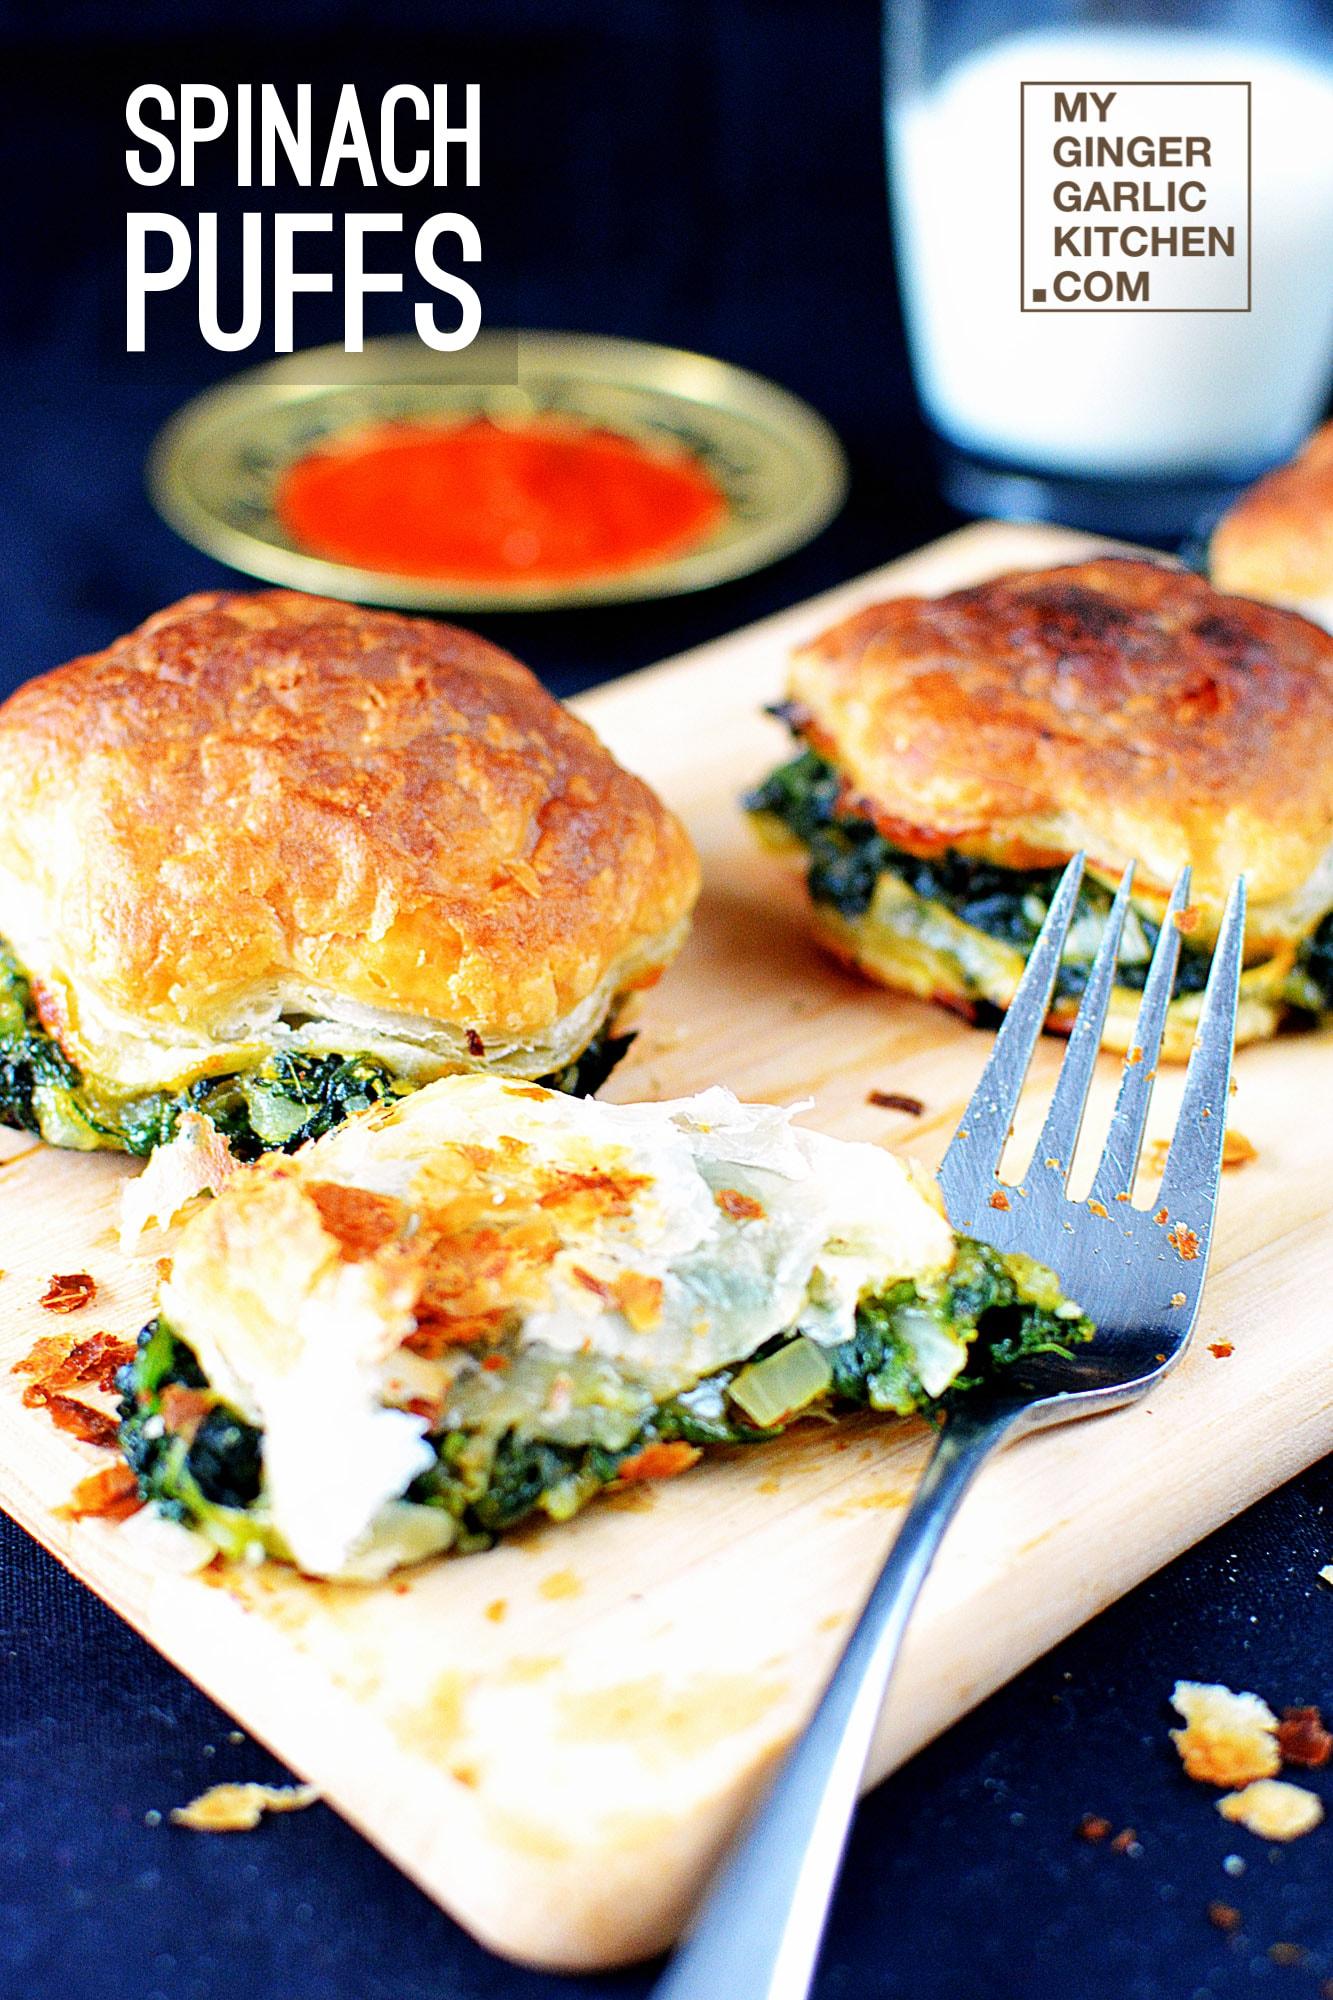 recipe-spinach-puffs-anupama-paliwal-my-ginger-garlic-kitchen-7-2 copy